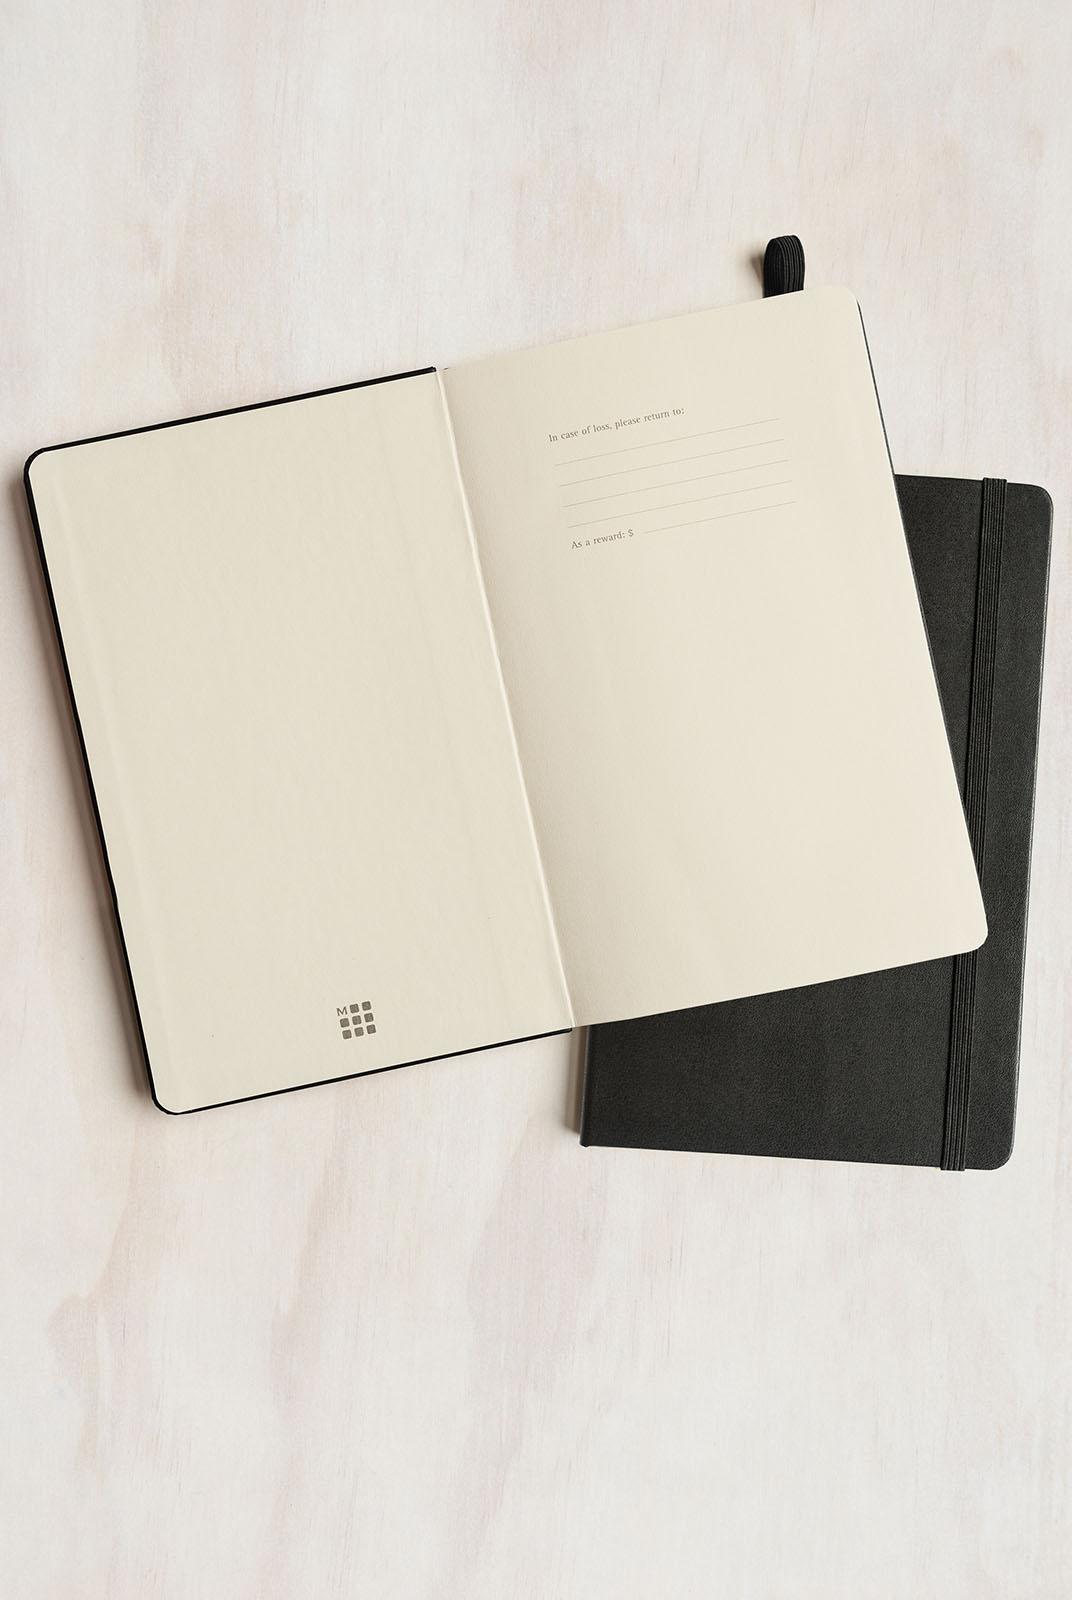 NEW Moleskine Classic Hard Cover Dotted Notebook Medium Black